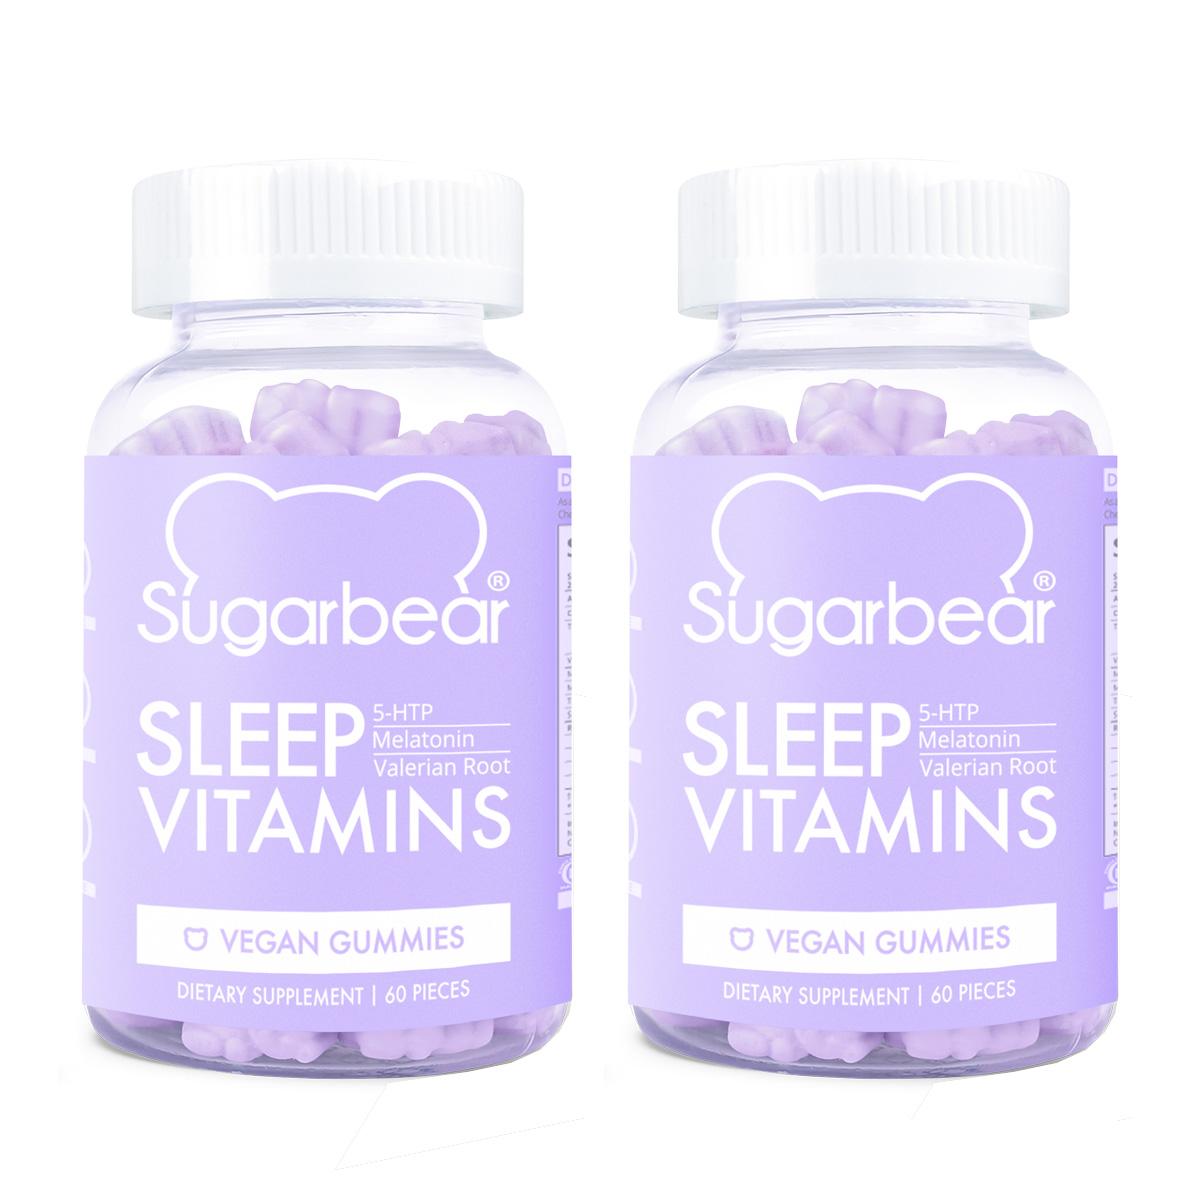 SugarBearHair SugarBear Sleep Vitamins 2 x 60 St. 133070